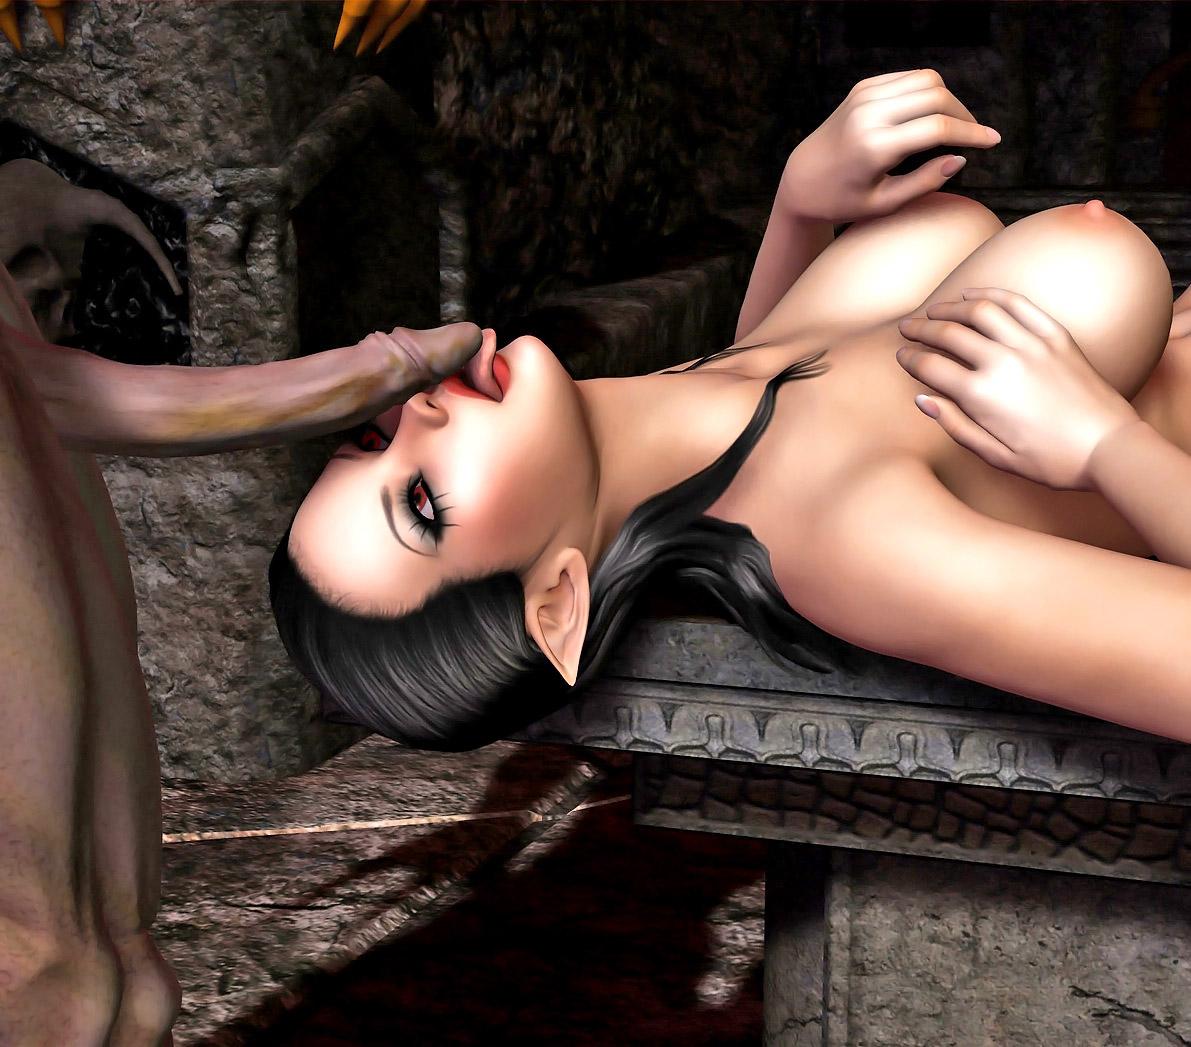 Hot elf woman sucs on cock porncraft scene